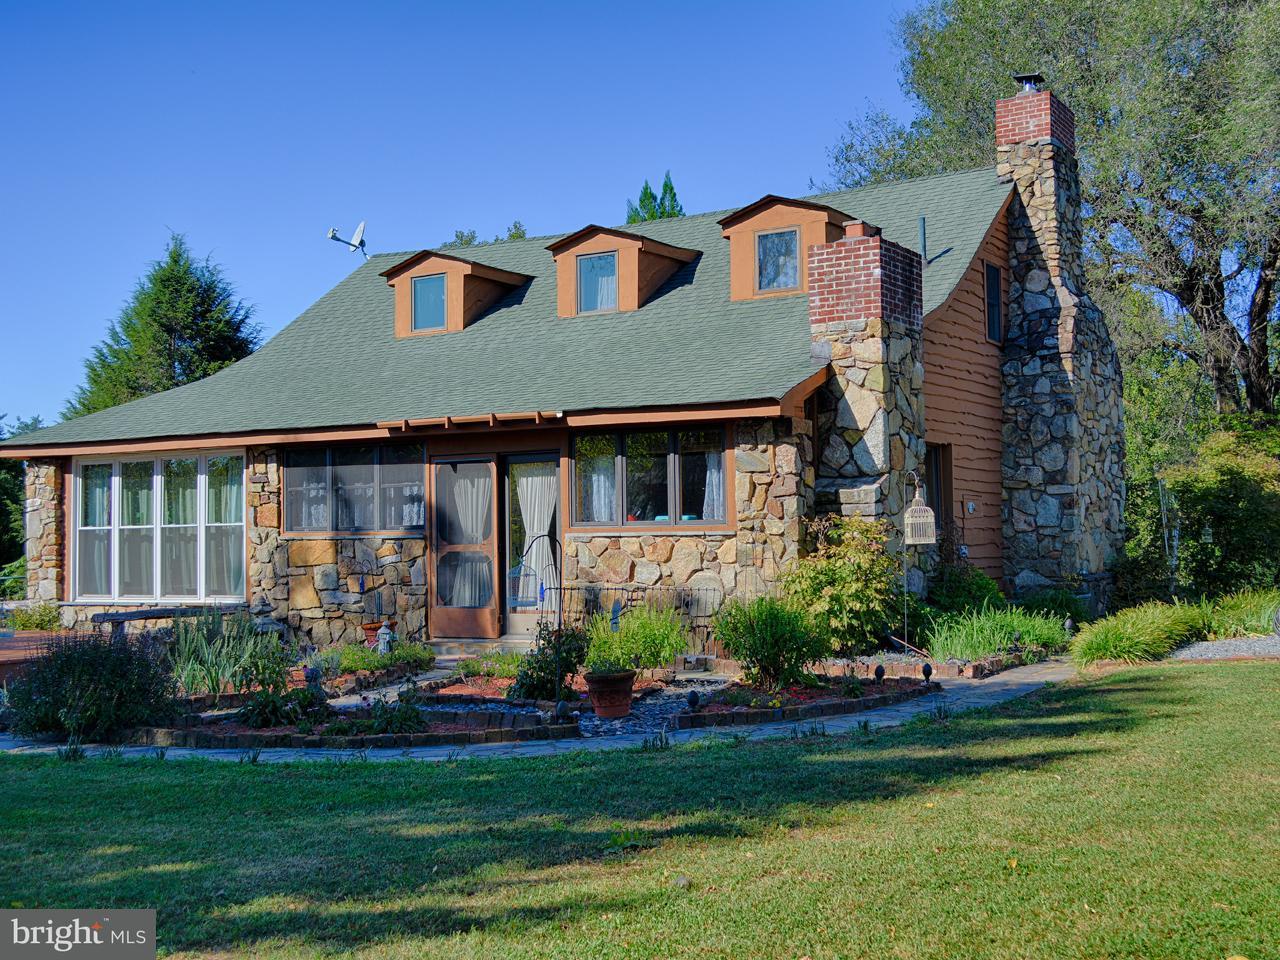 Single Family Home for Sale at 2854 SECRETARYS Road 2854 SECRETARYS Road Scottsville, Virginia 24590 United States